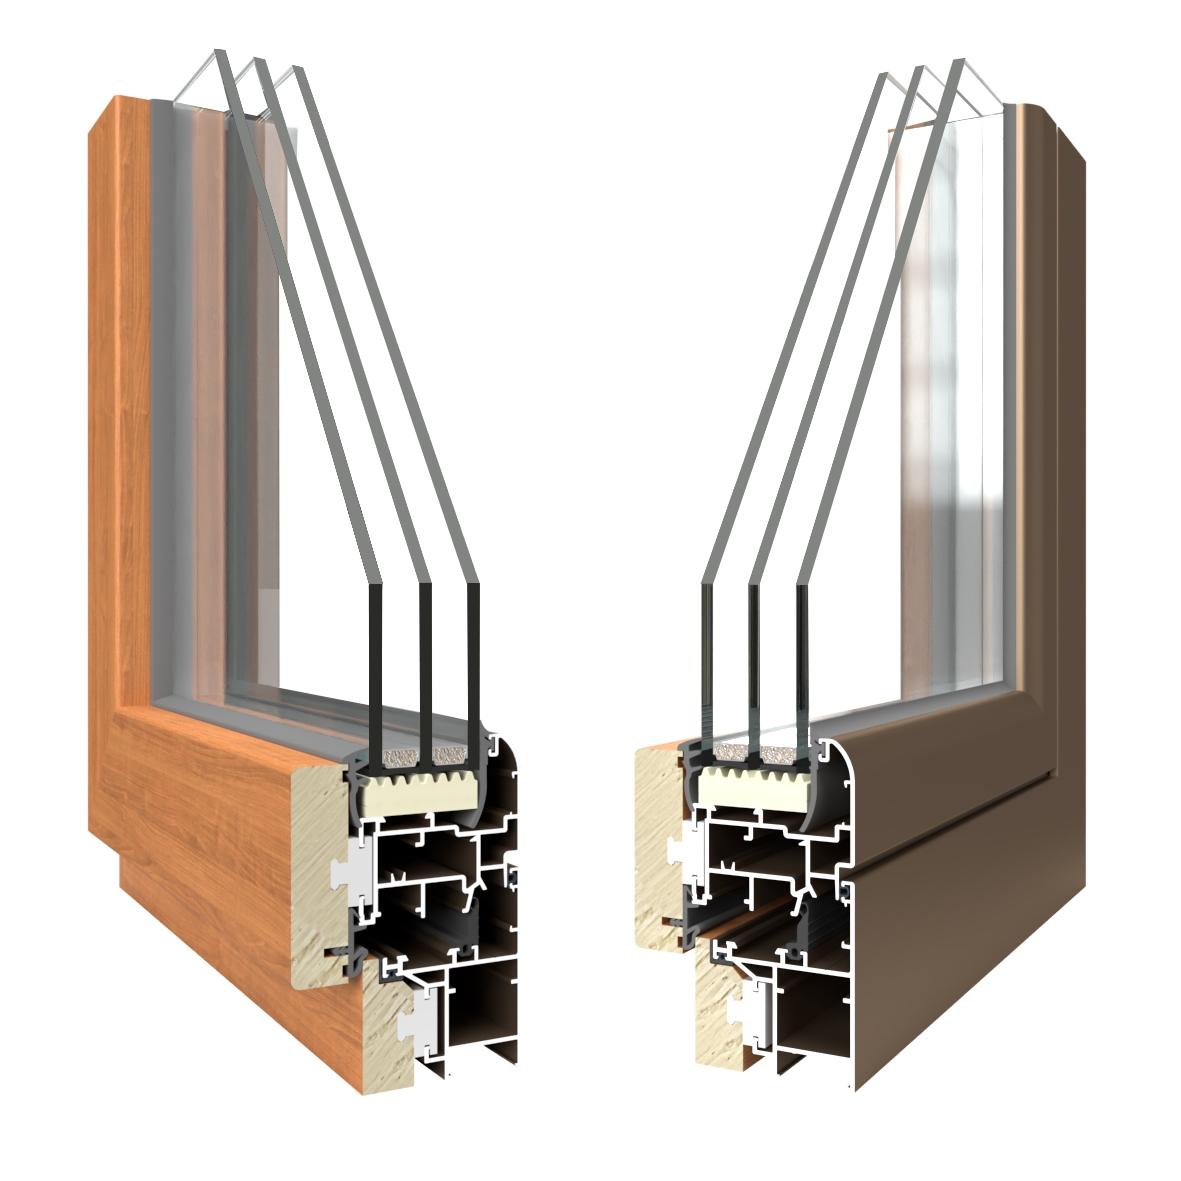 https://www.allpaint.it/wp-content/uploads/2021/07/finestre-alluminio-legno-woodline-plus-allpaint.jpg